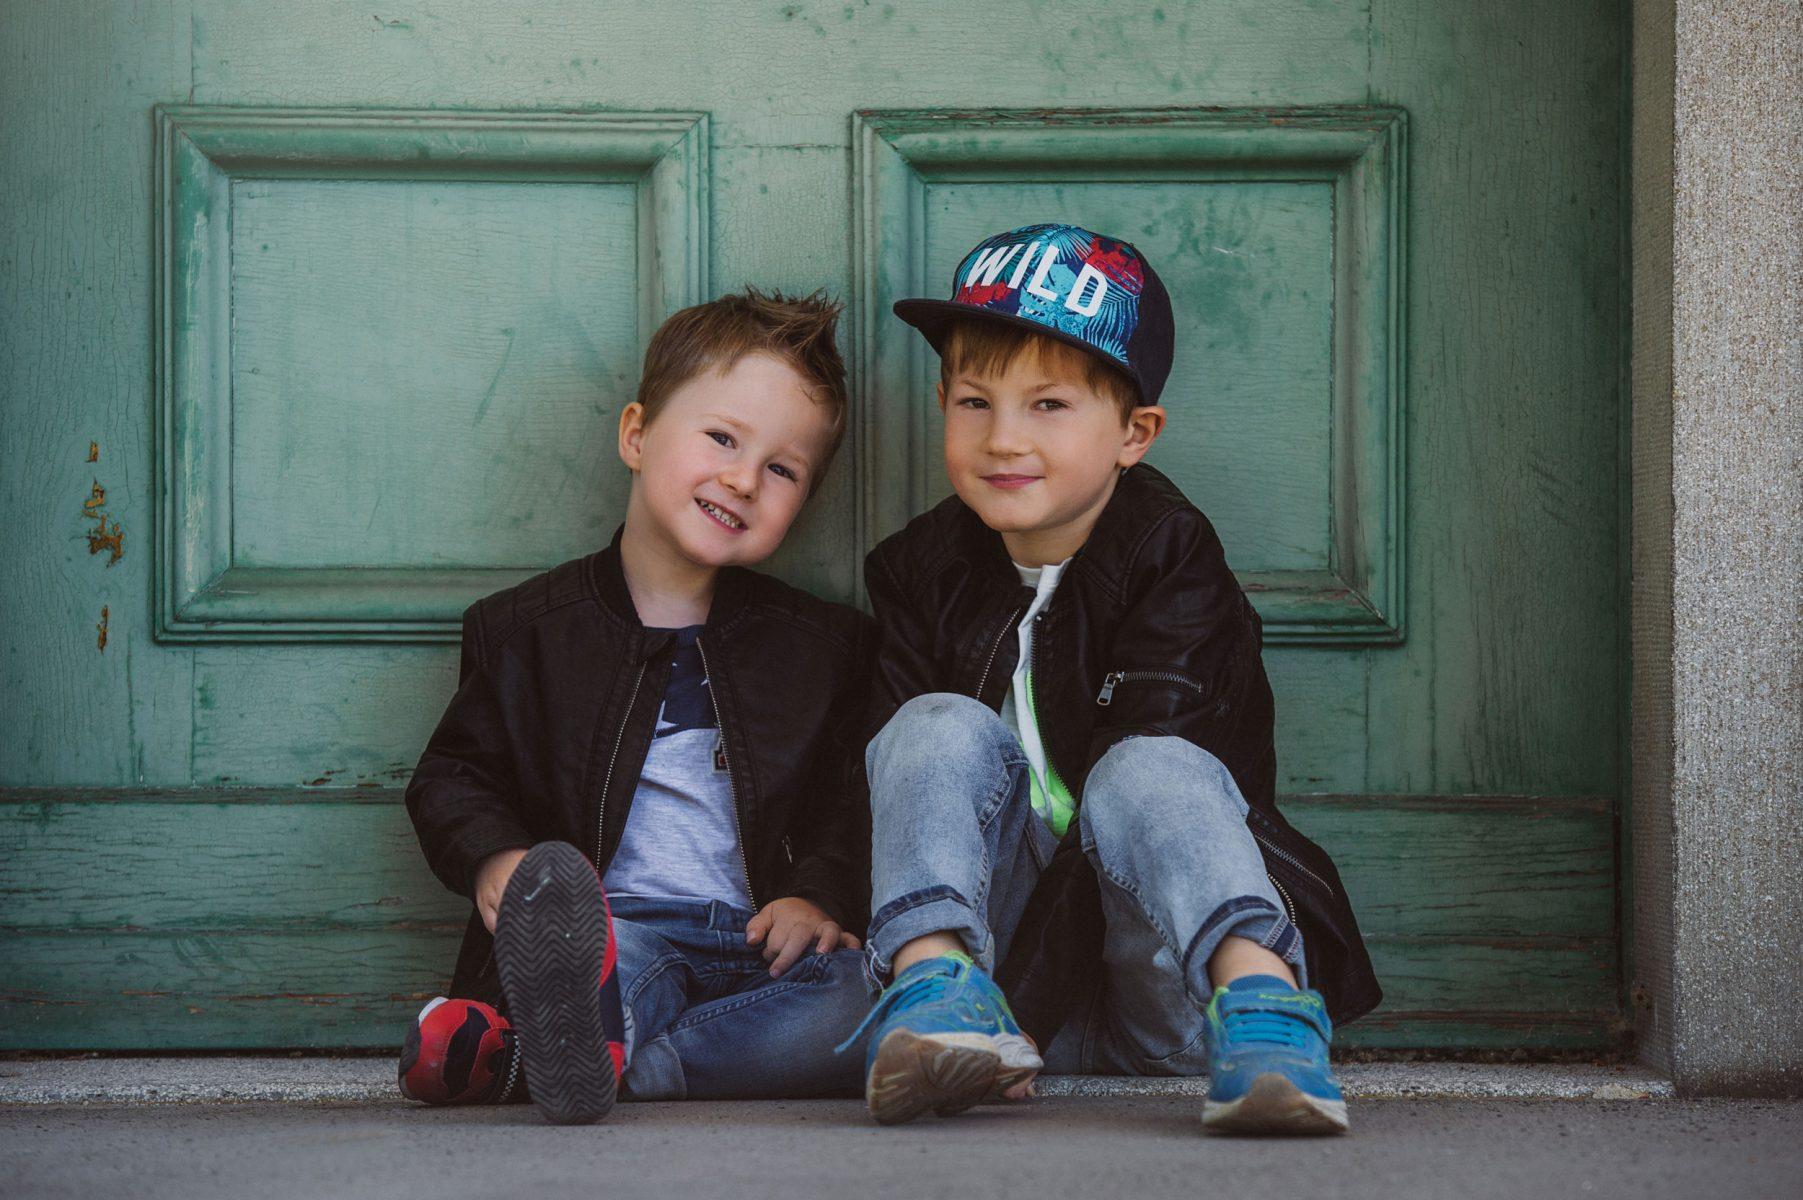 portrait lifestlye lifestylephotographer beautyportrait luxembourg portrait luxembourg kids kidsphotography kinder kinderfotografie